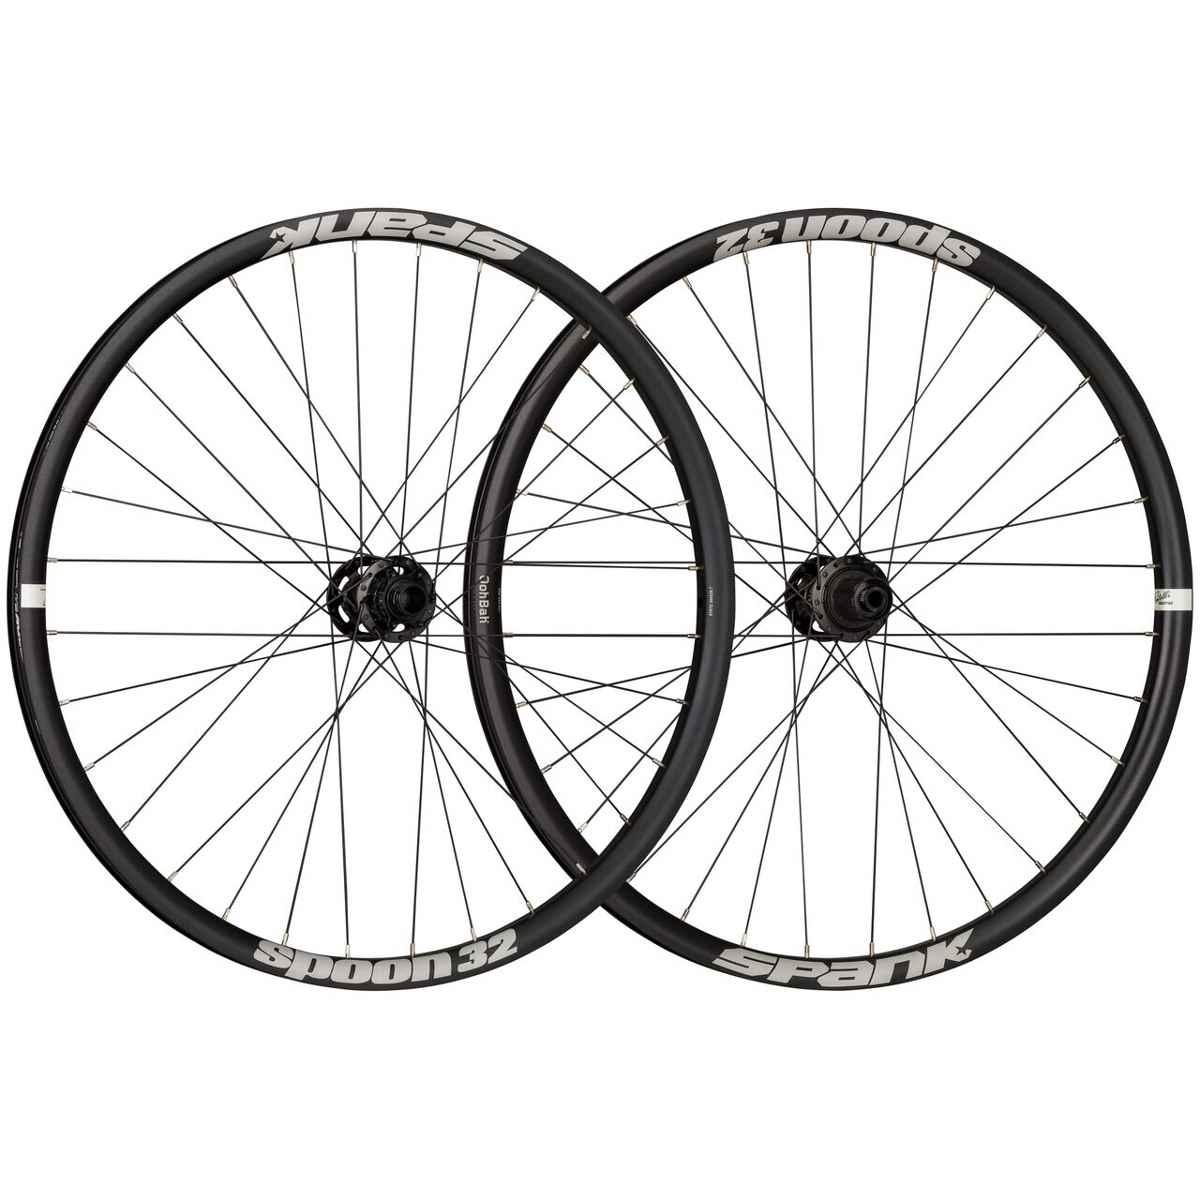 Spank Spoon 32 26 inch Wheelset, 12X135+12X142, Hg, Blk - C08N3211120ASPK